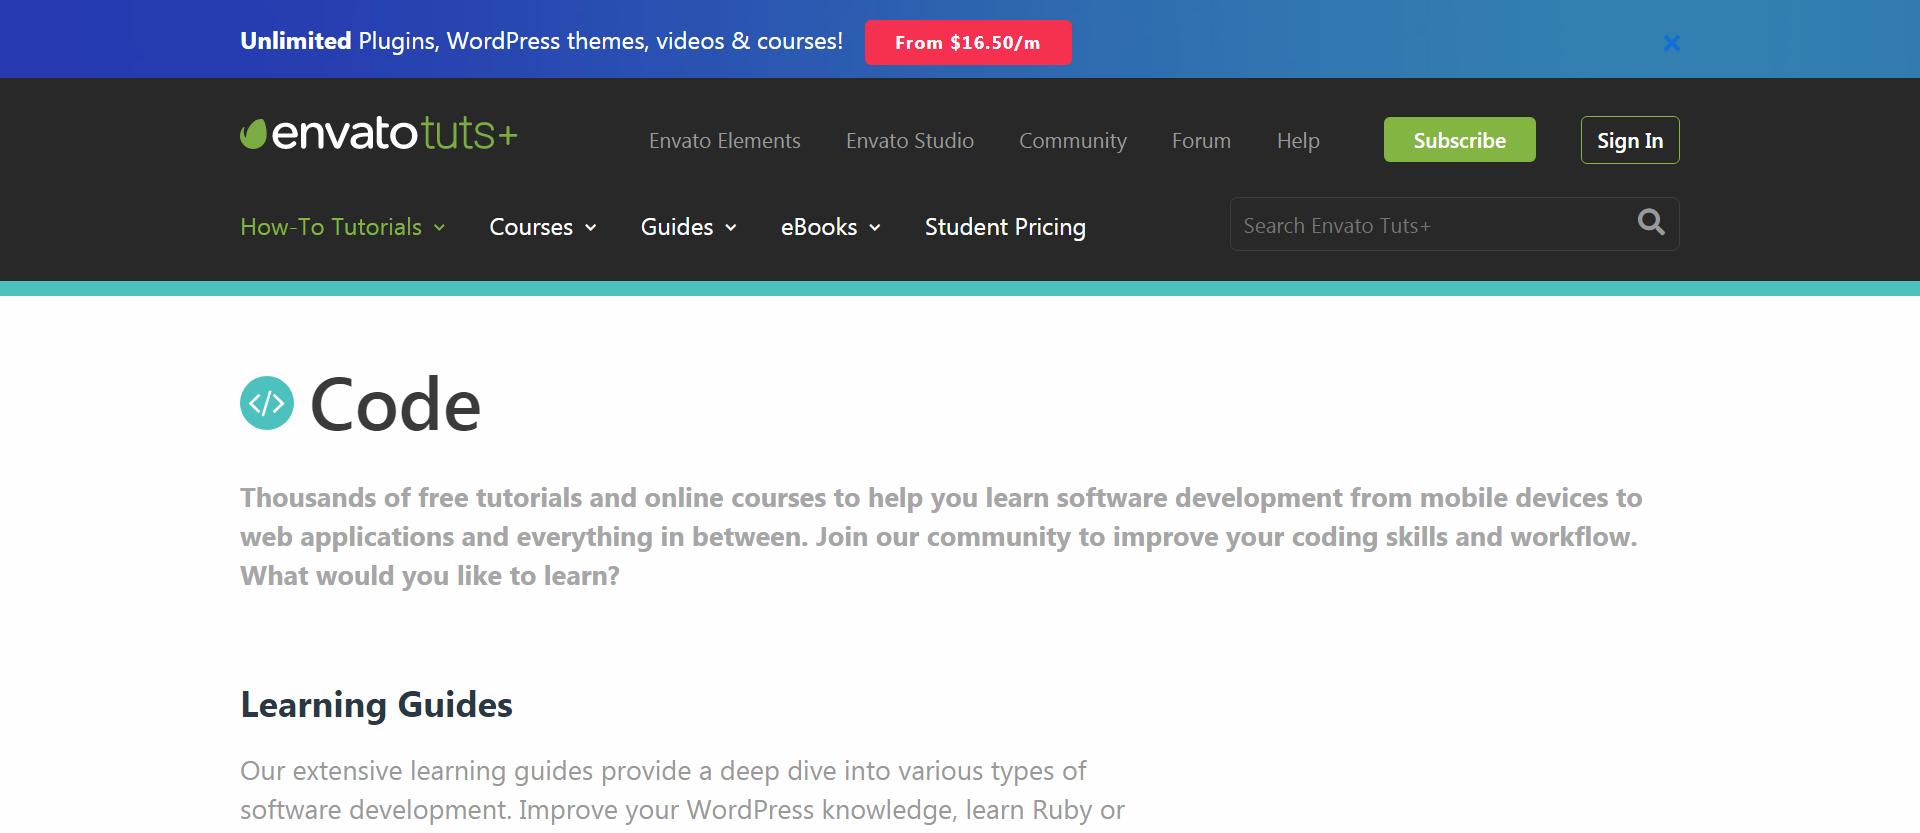 codetuts+ newsletter from envato